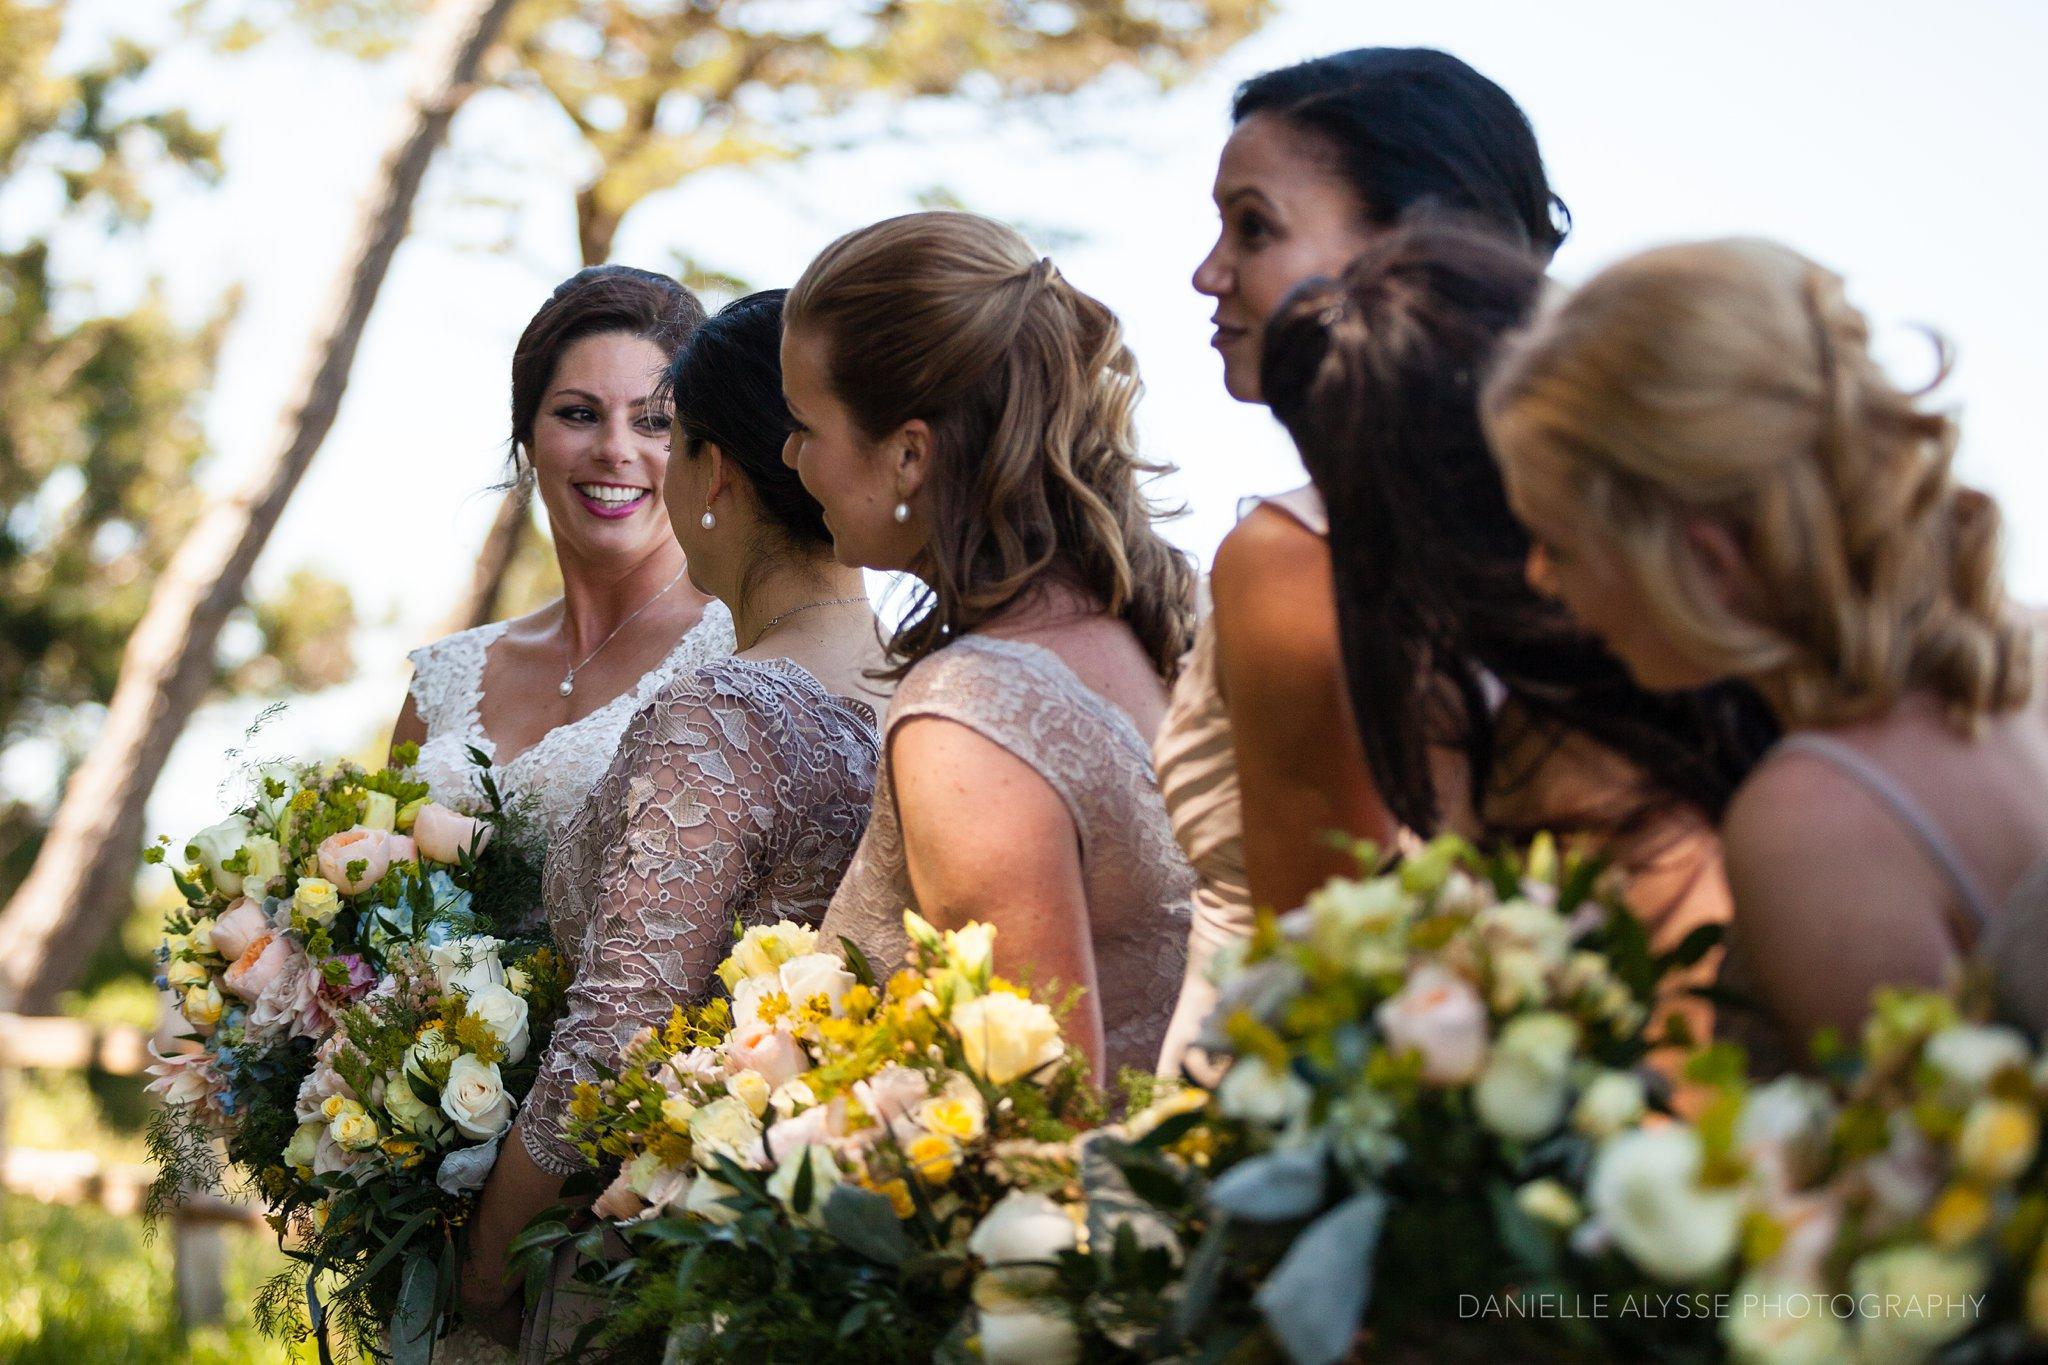 170429_blog_kimberly_ben_wedding_san_mateo_curiodyssey_danielle_alysse_photography_sacramento_photographer0296_WEB.jpg